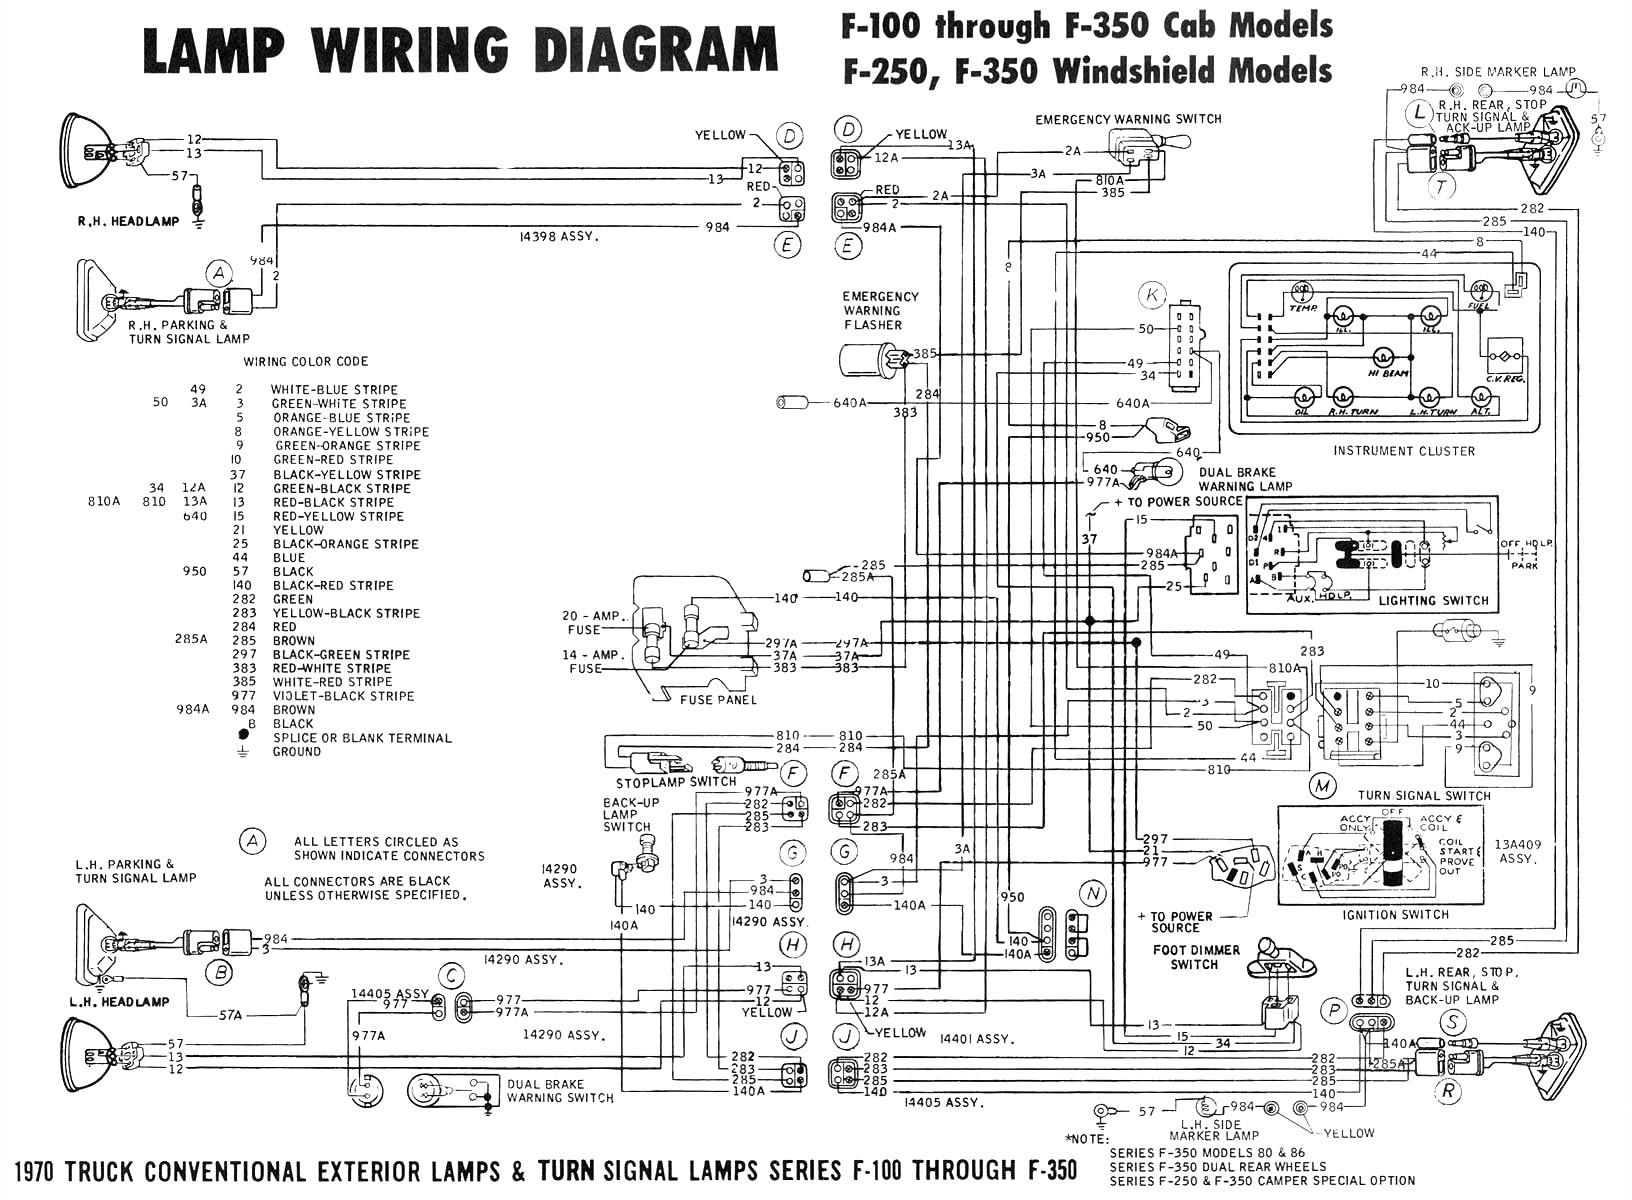 2004 Jeep Liberty Wiring Diagram 2004 Jeep Tail Light Fuse Box Diagram Wiring Diagram Blog